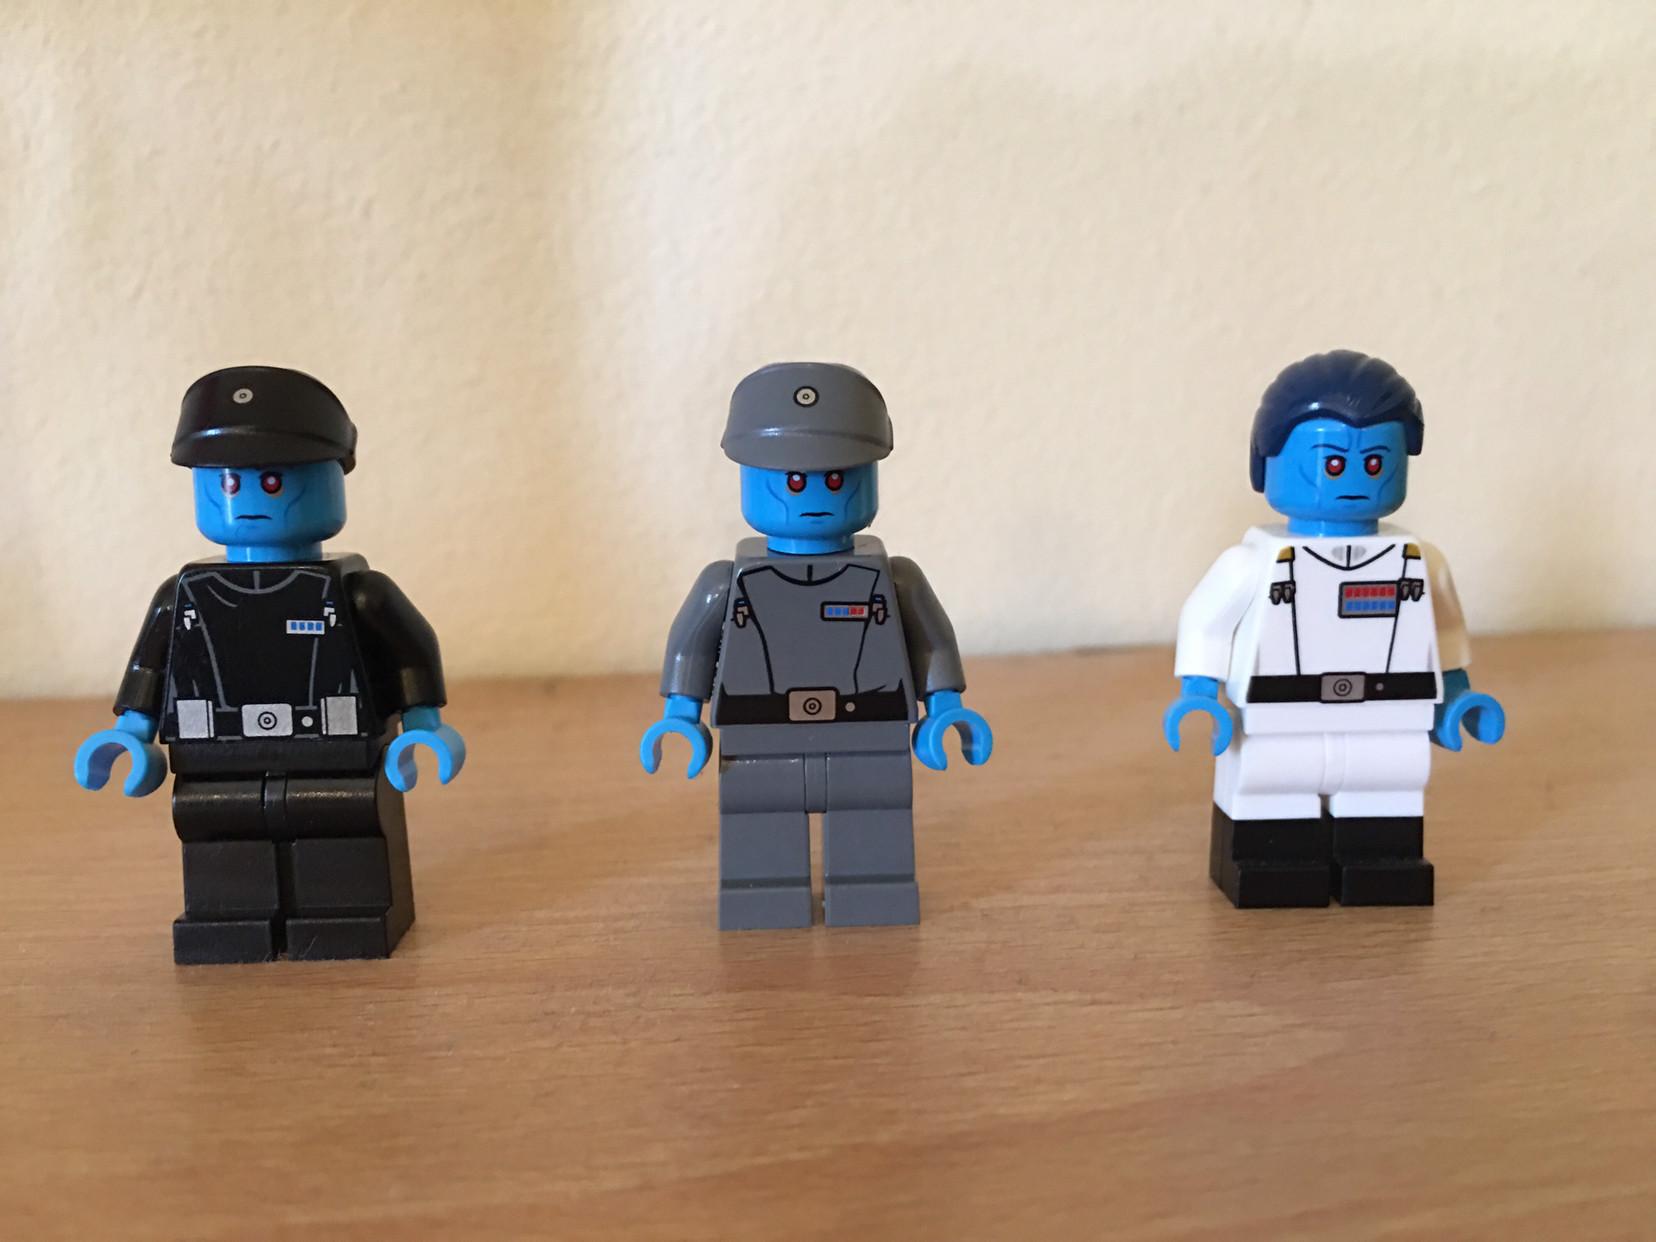 [Lego] Lieutenant Thrawn, Commodore Thrawn, Grand Admiral Thrawn